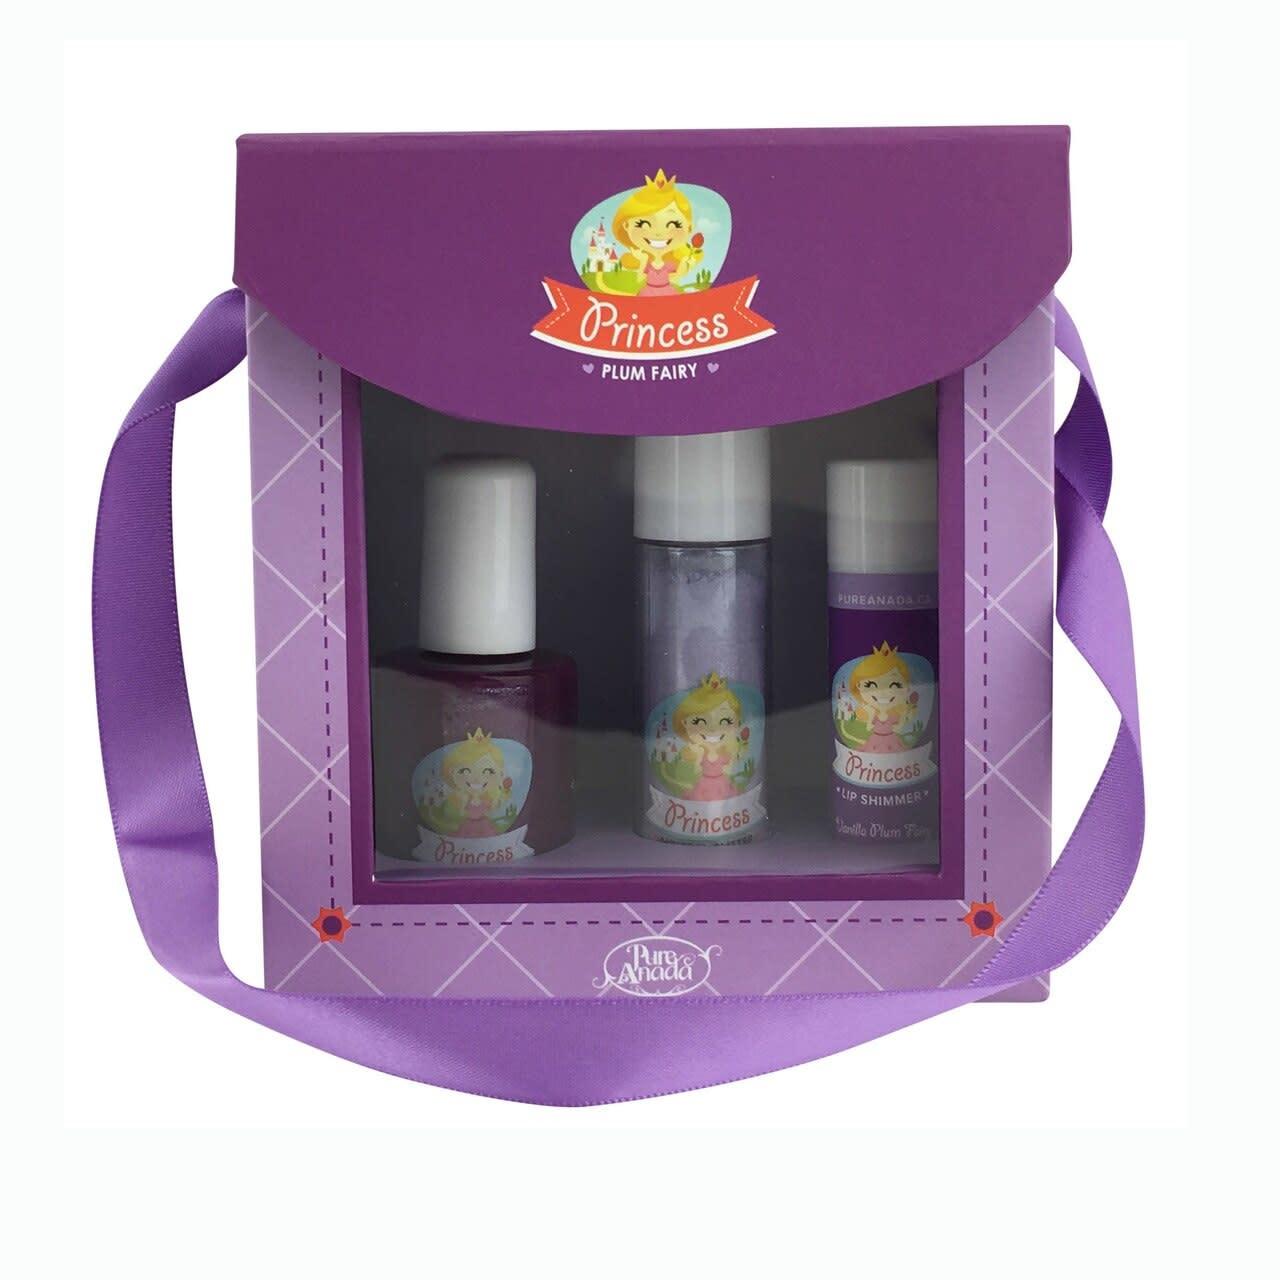 Princess Pack - Plum Fairy-1